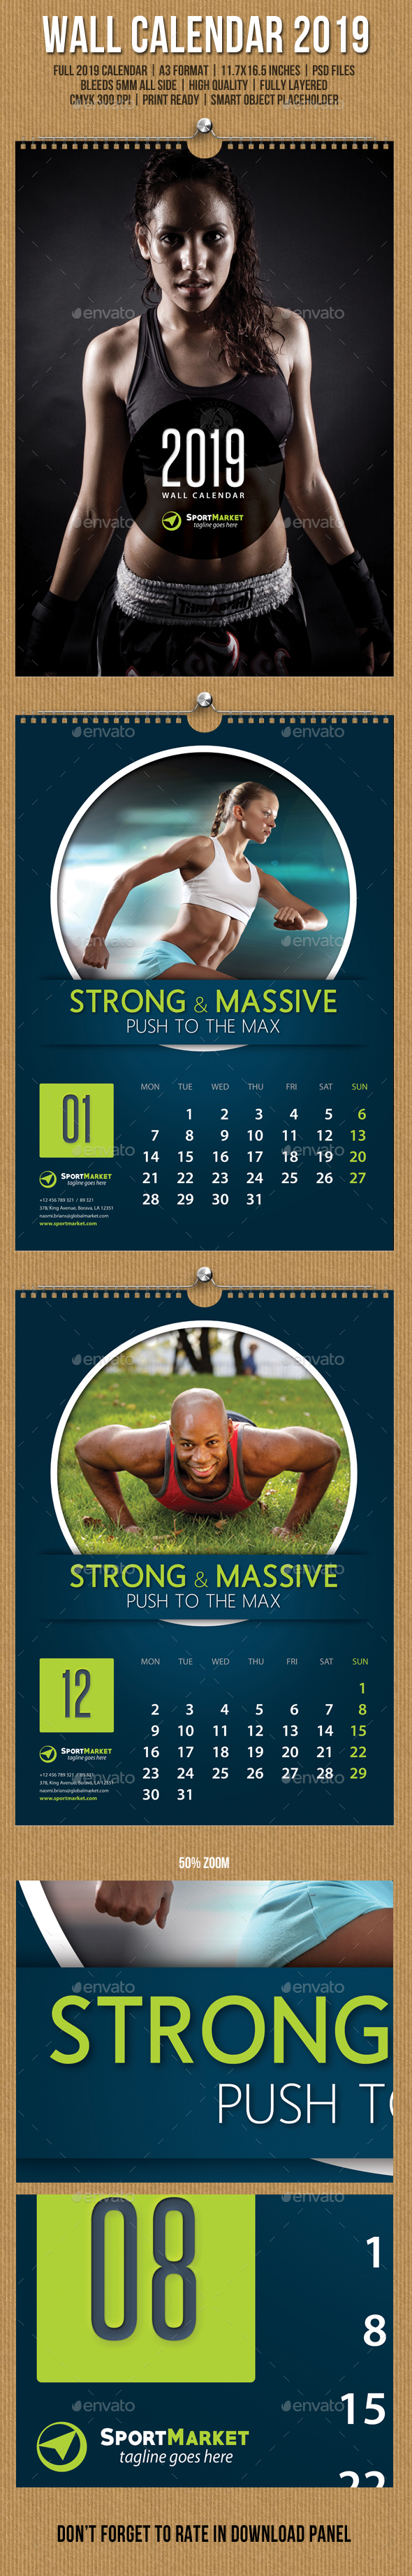 Wall Calendar A3 2019 v20 - Calendars Stationery